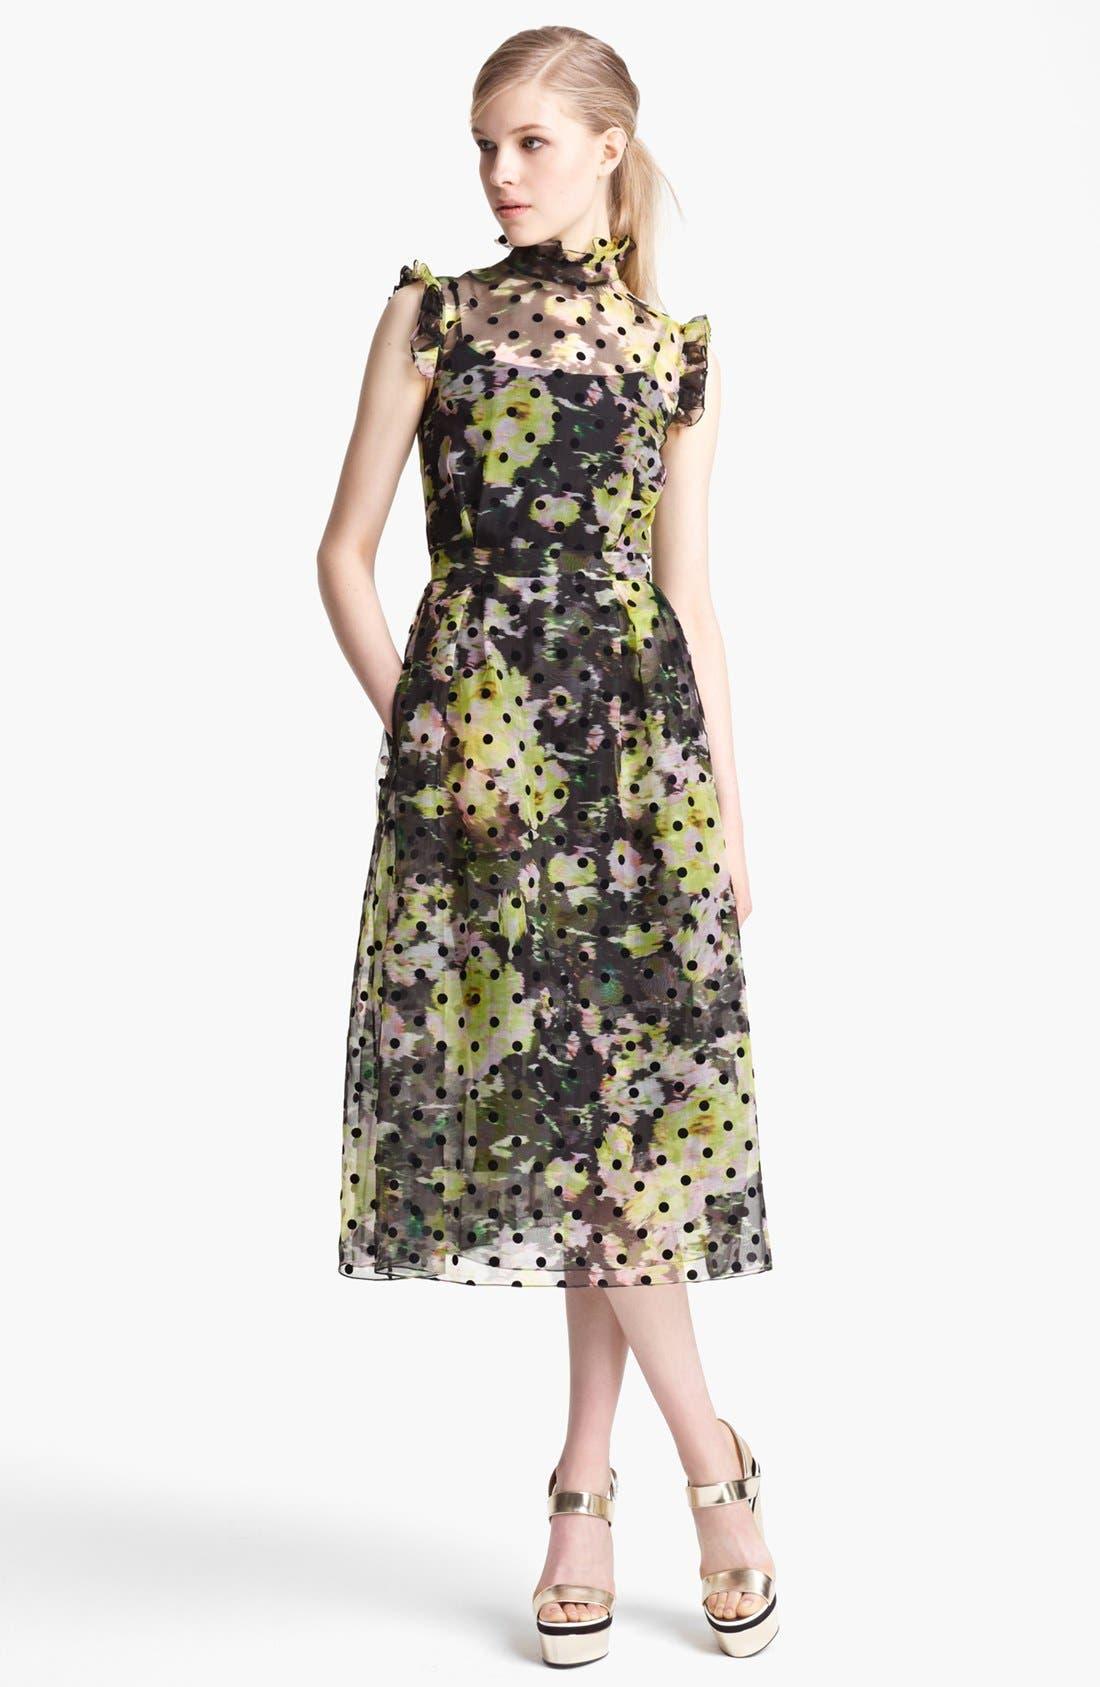 Alternate Image 1 Selected - Erdem 'Clarity' Dot Floral Print Organza Dress